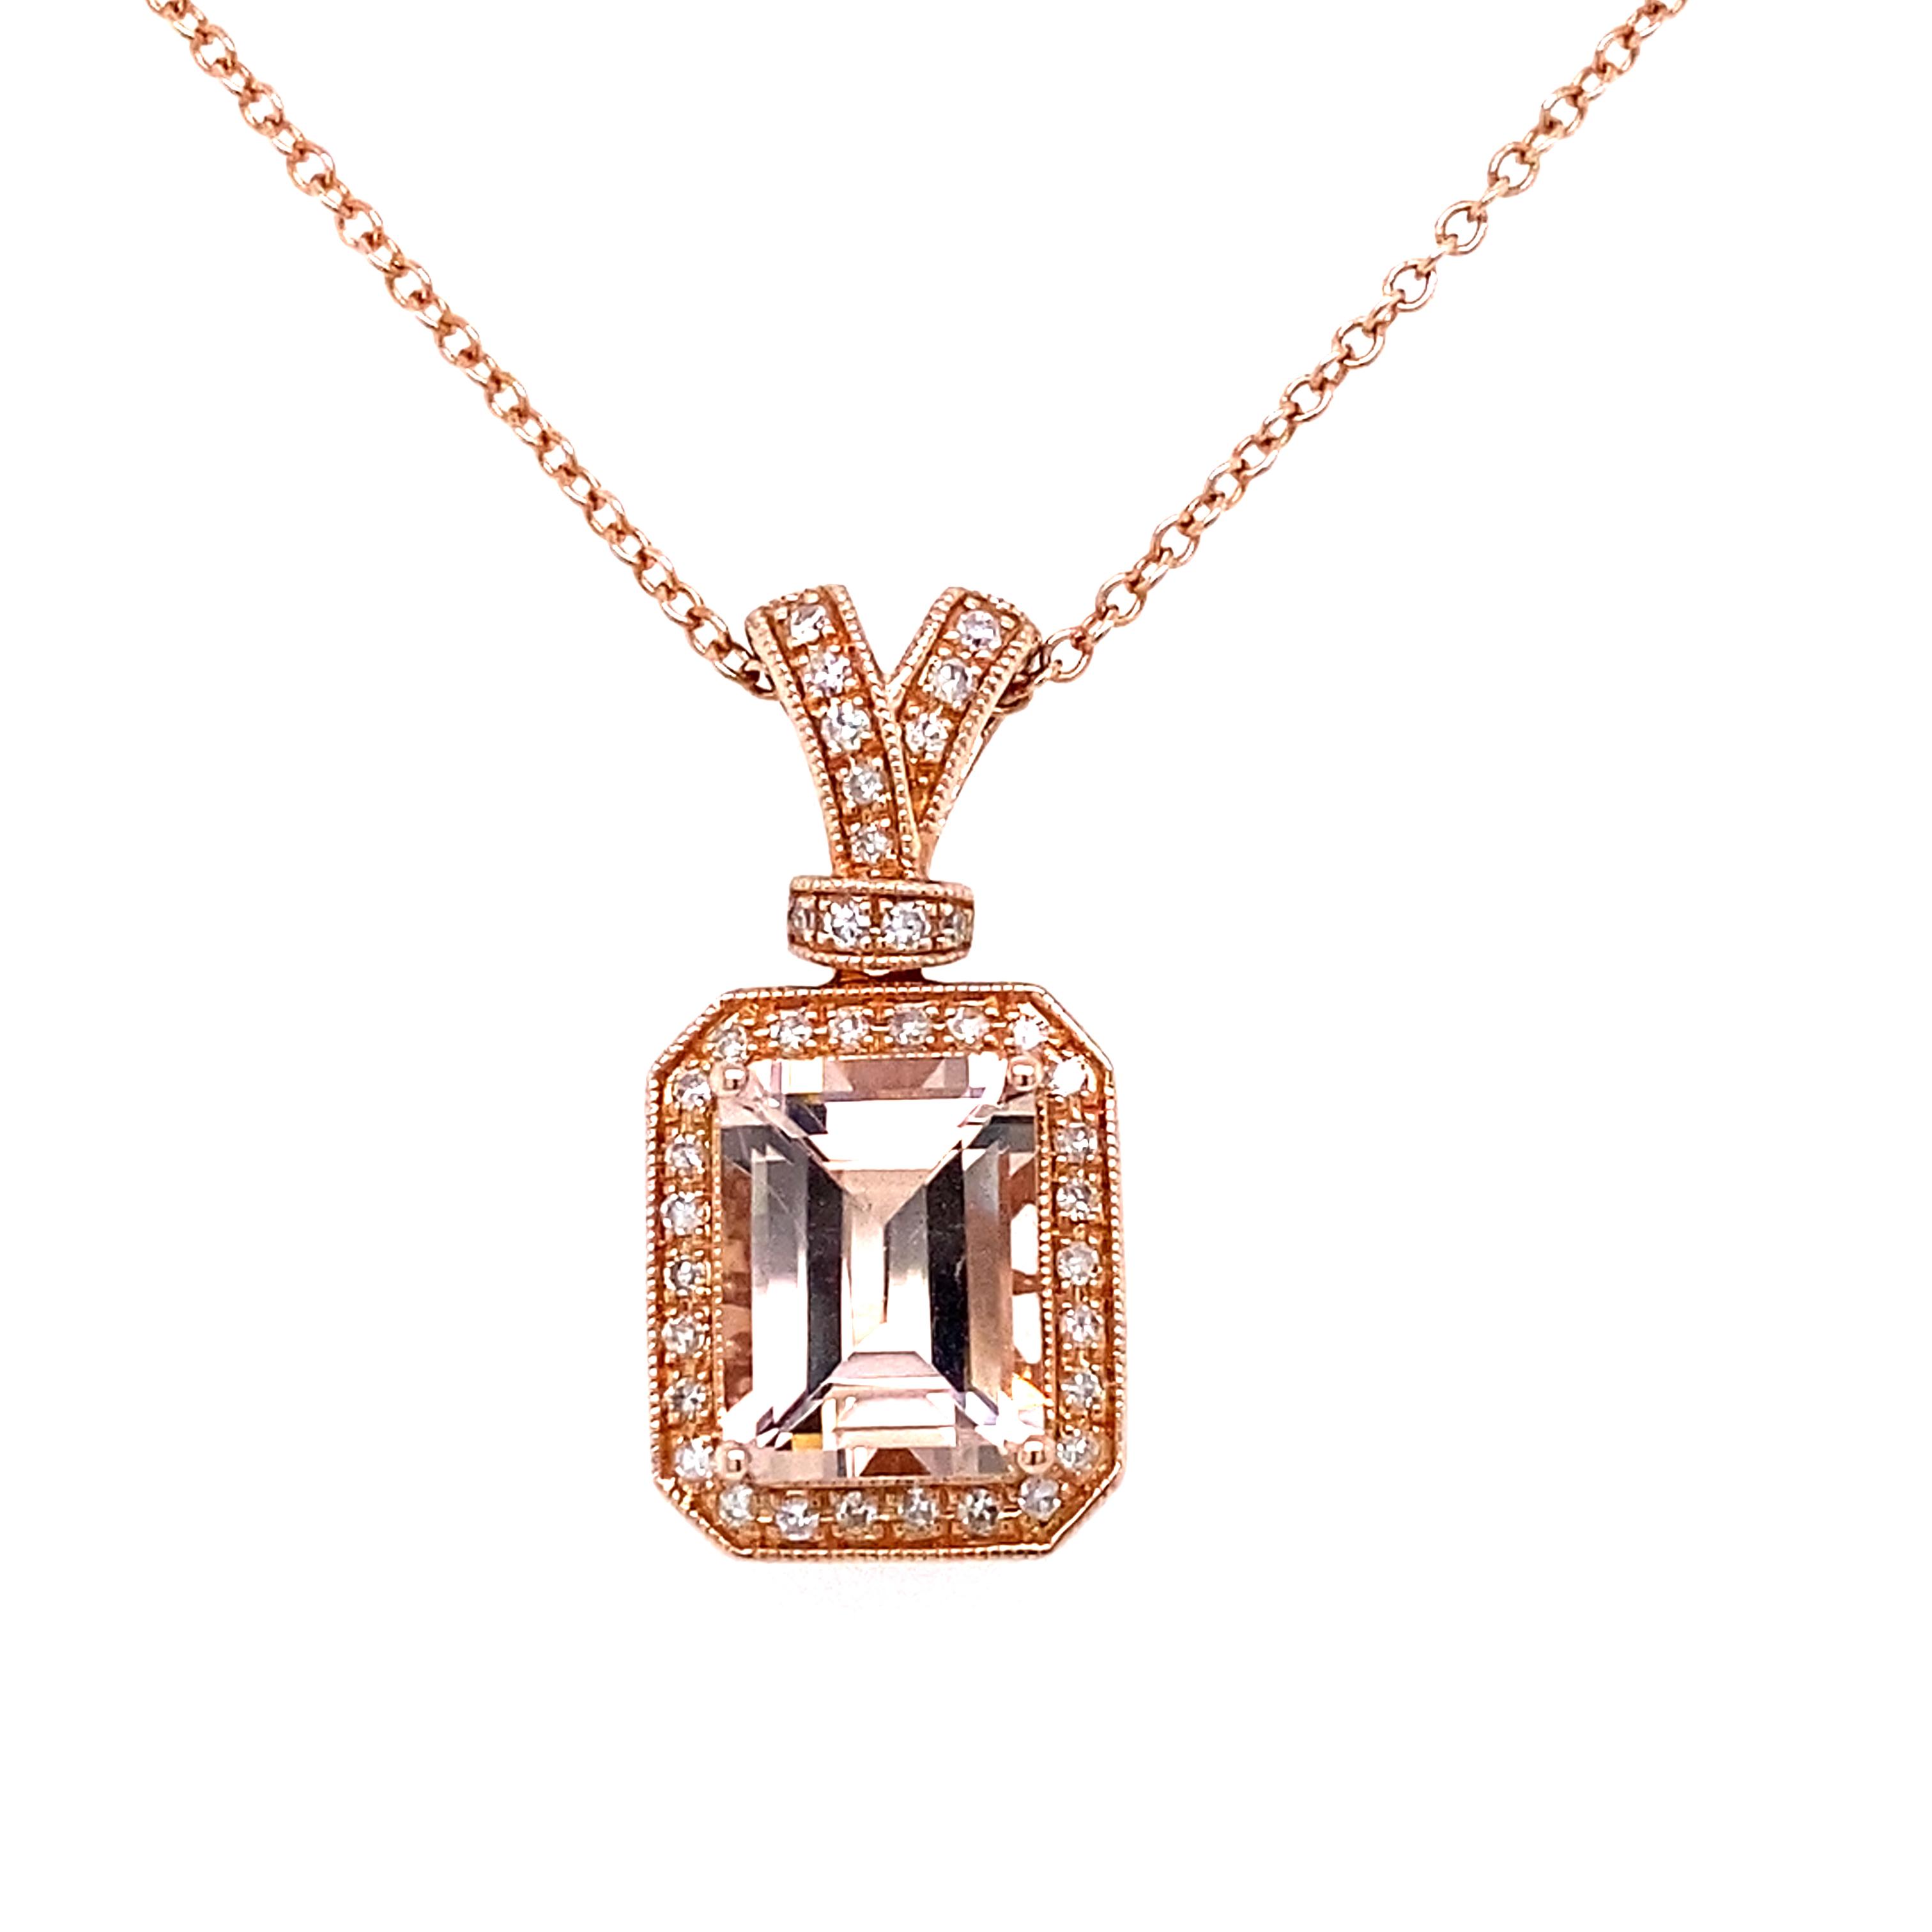 14ct Rose Gold Morganite and Diamond Deco Style Pendant